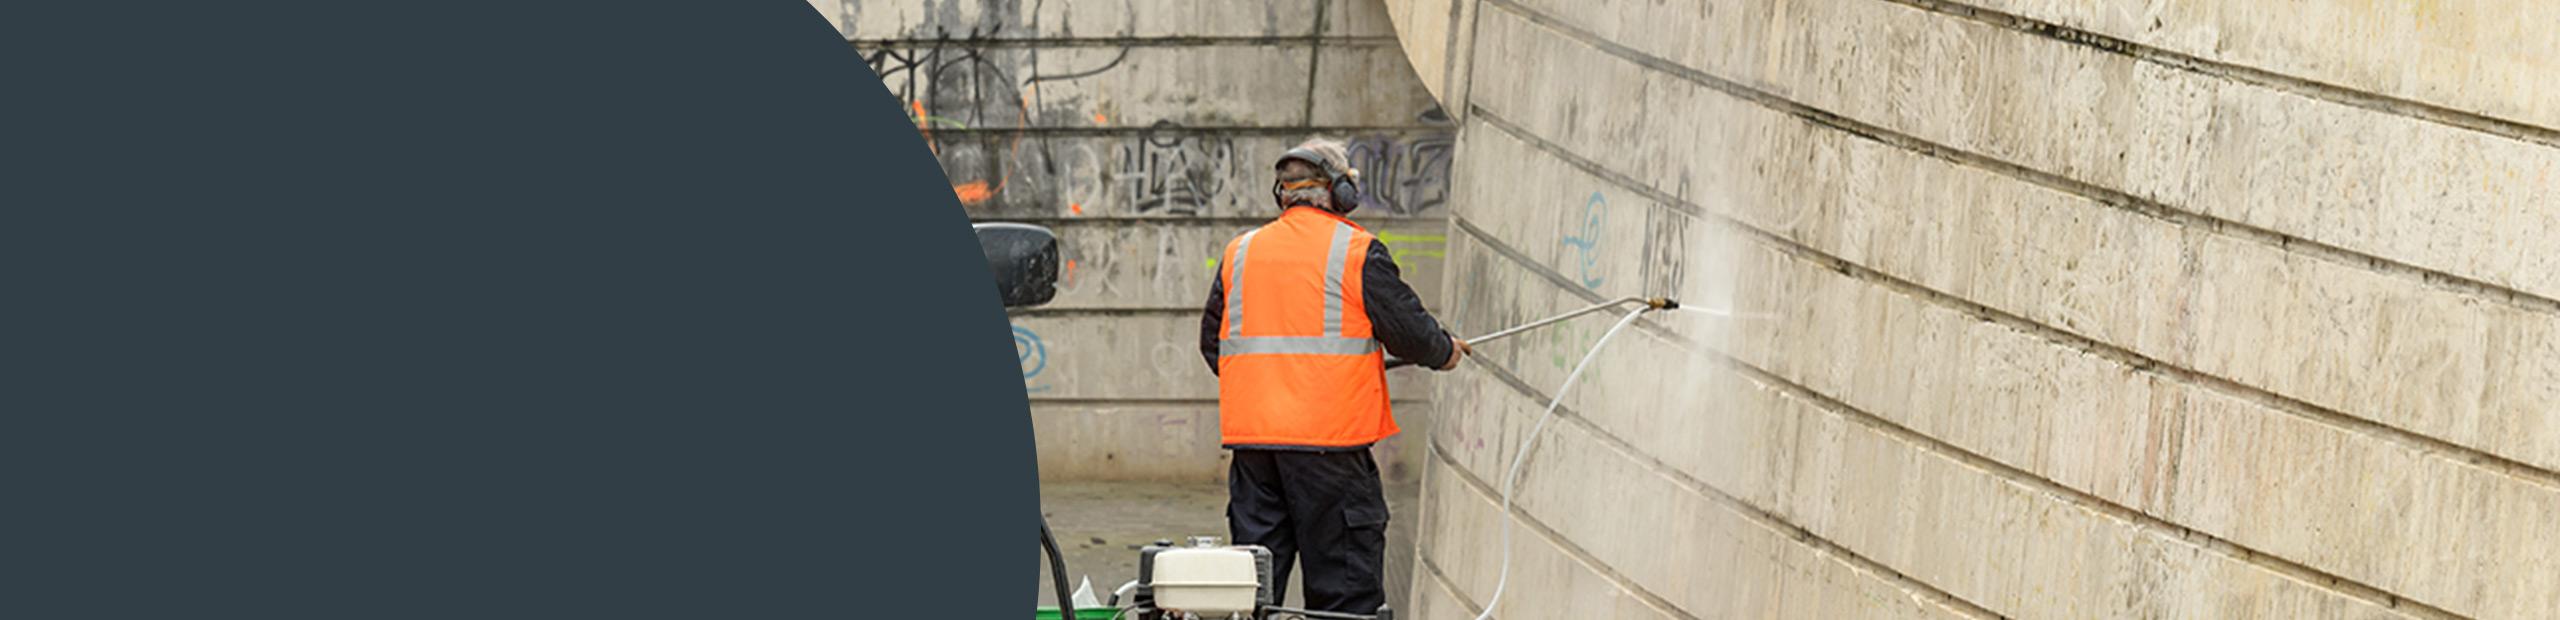 Graffiti Removal London Image